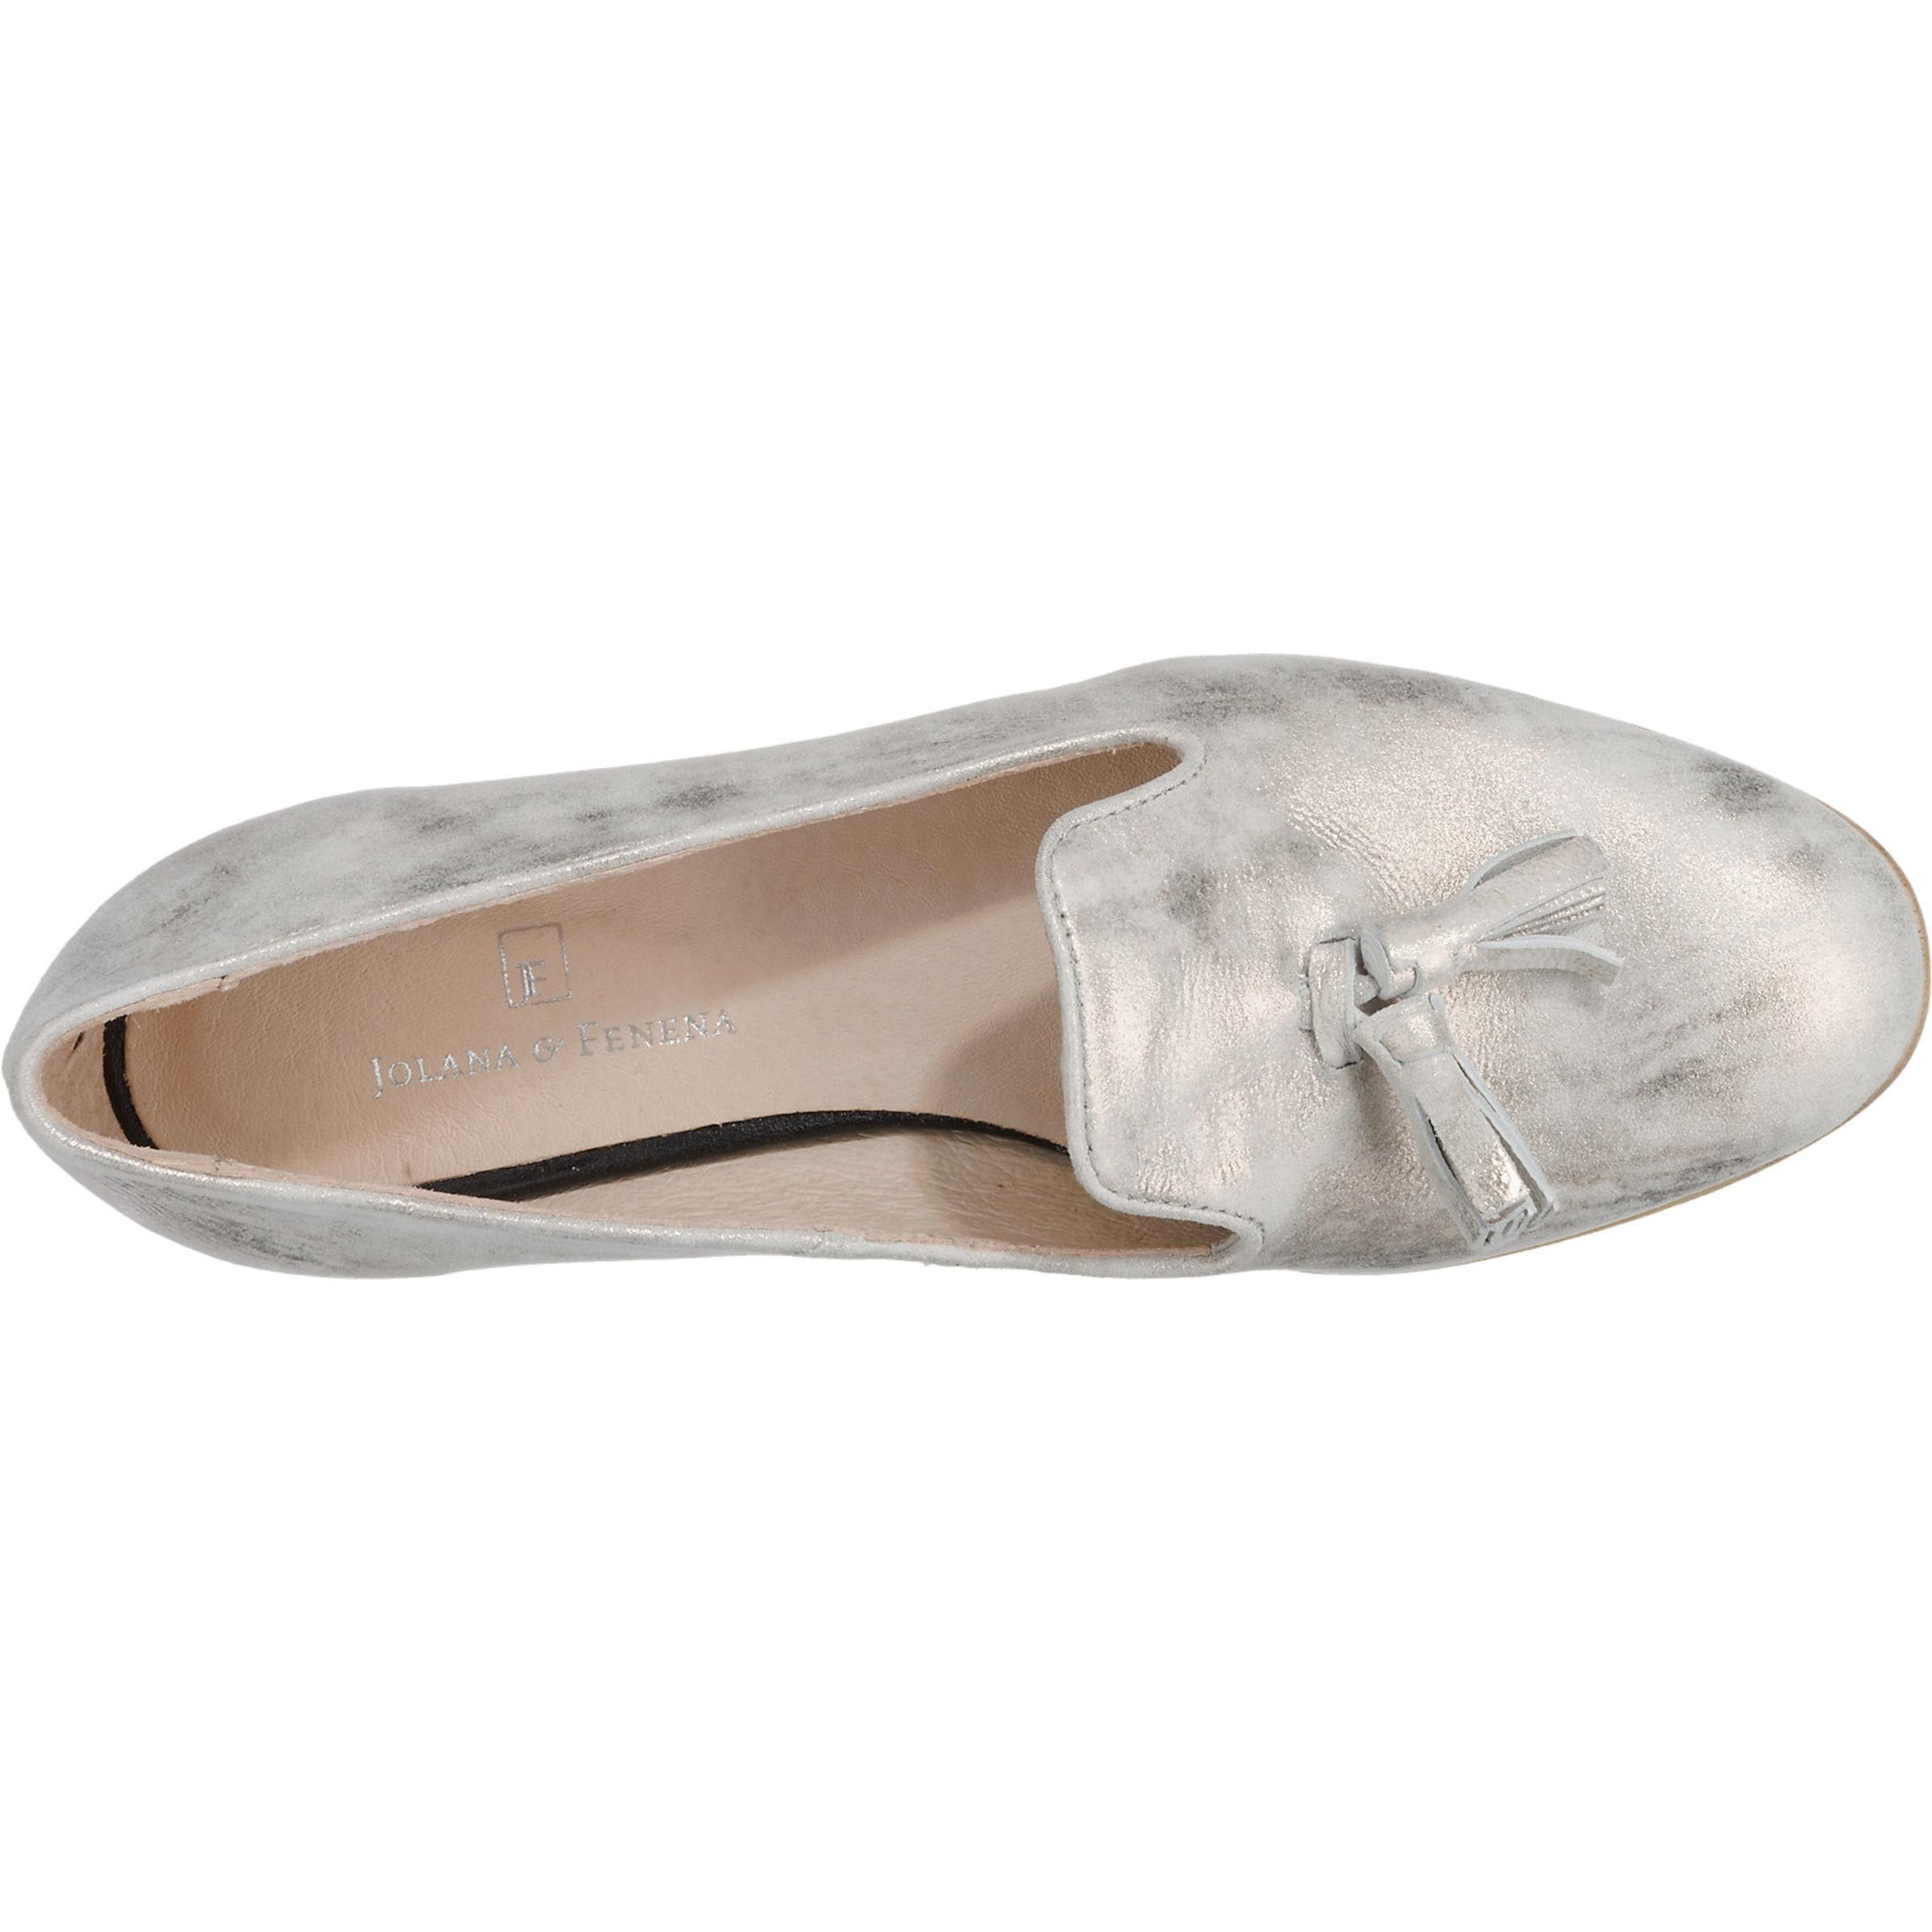 Silbergrau Jolanaamp; Ballerinas Jolanaamp; In Fenena Ballerinas Fenena In vmn0Oy8wN